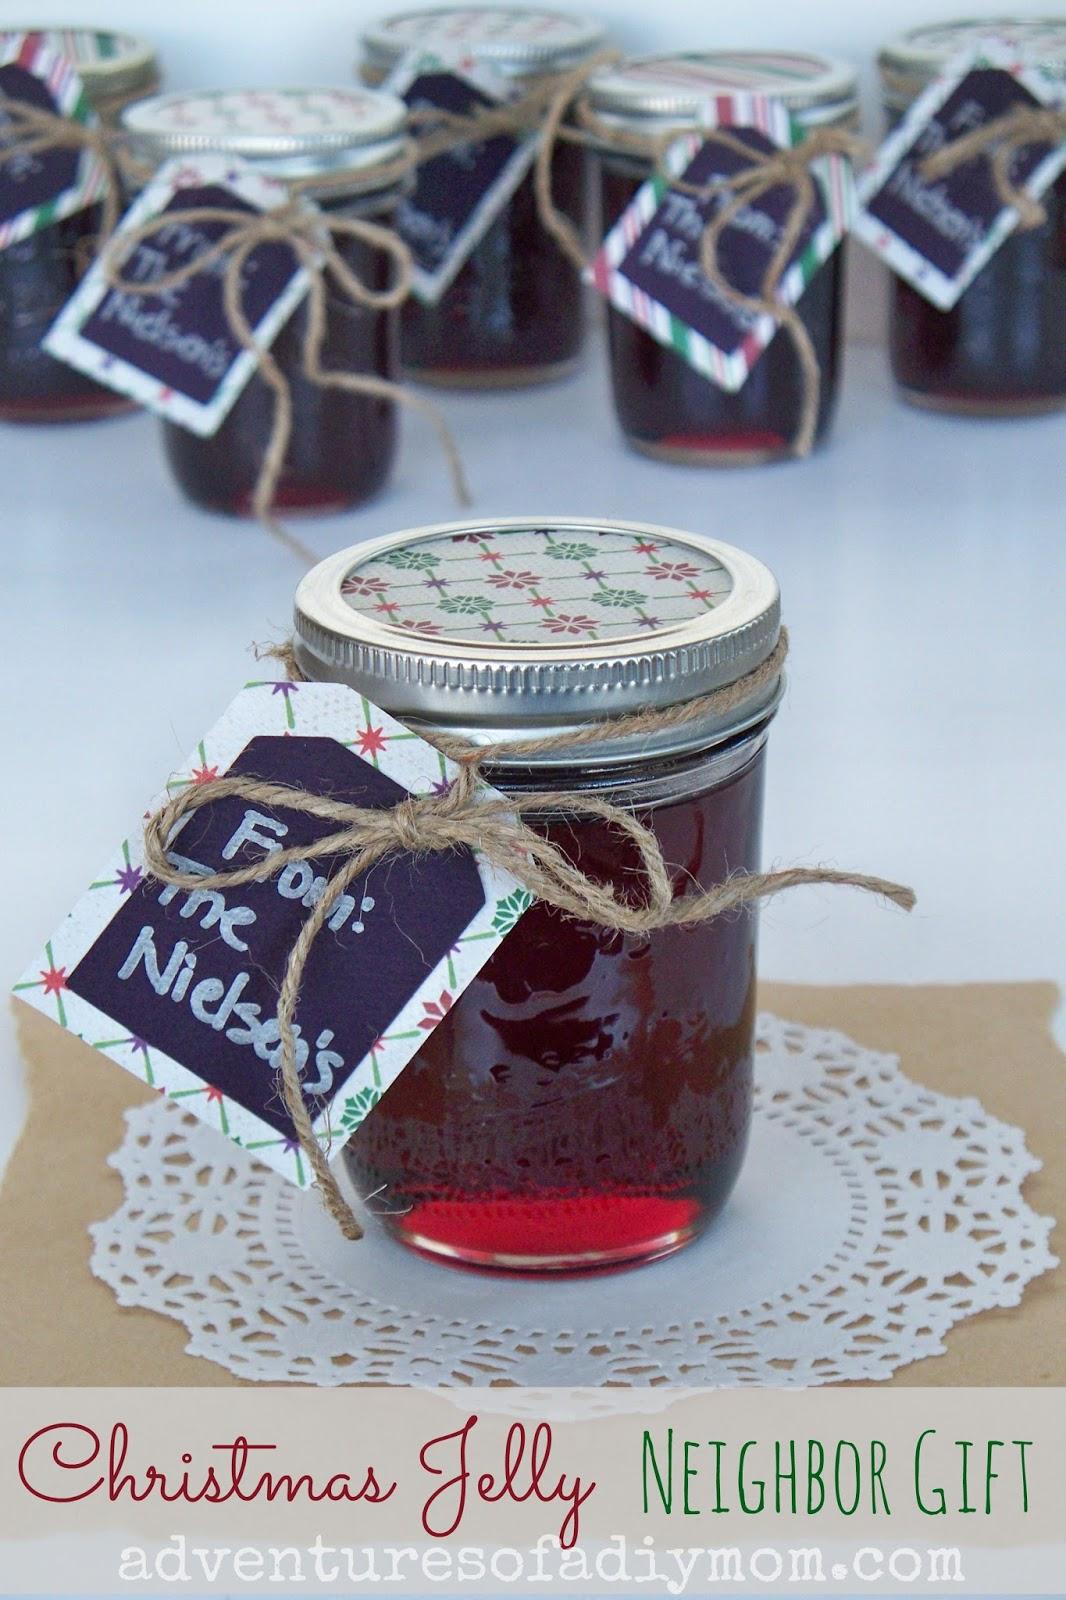 Christmas Jelly Neighbor Gift